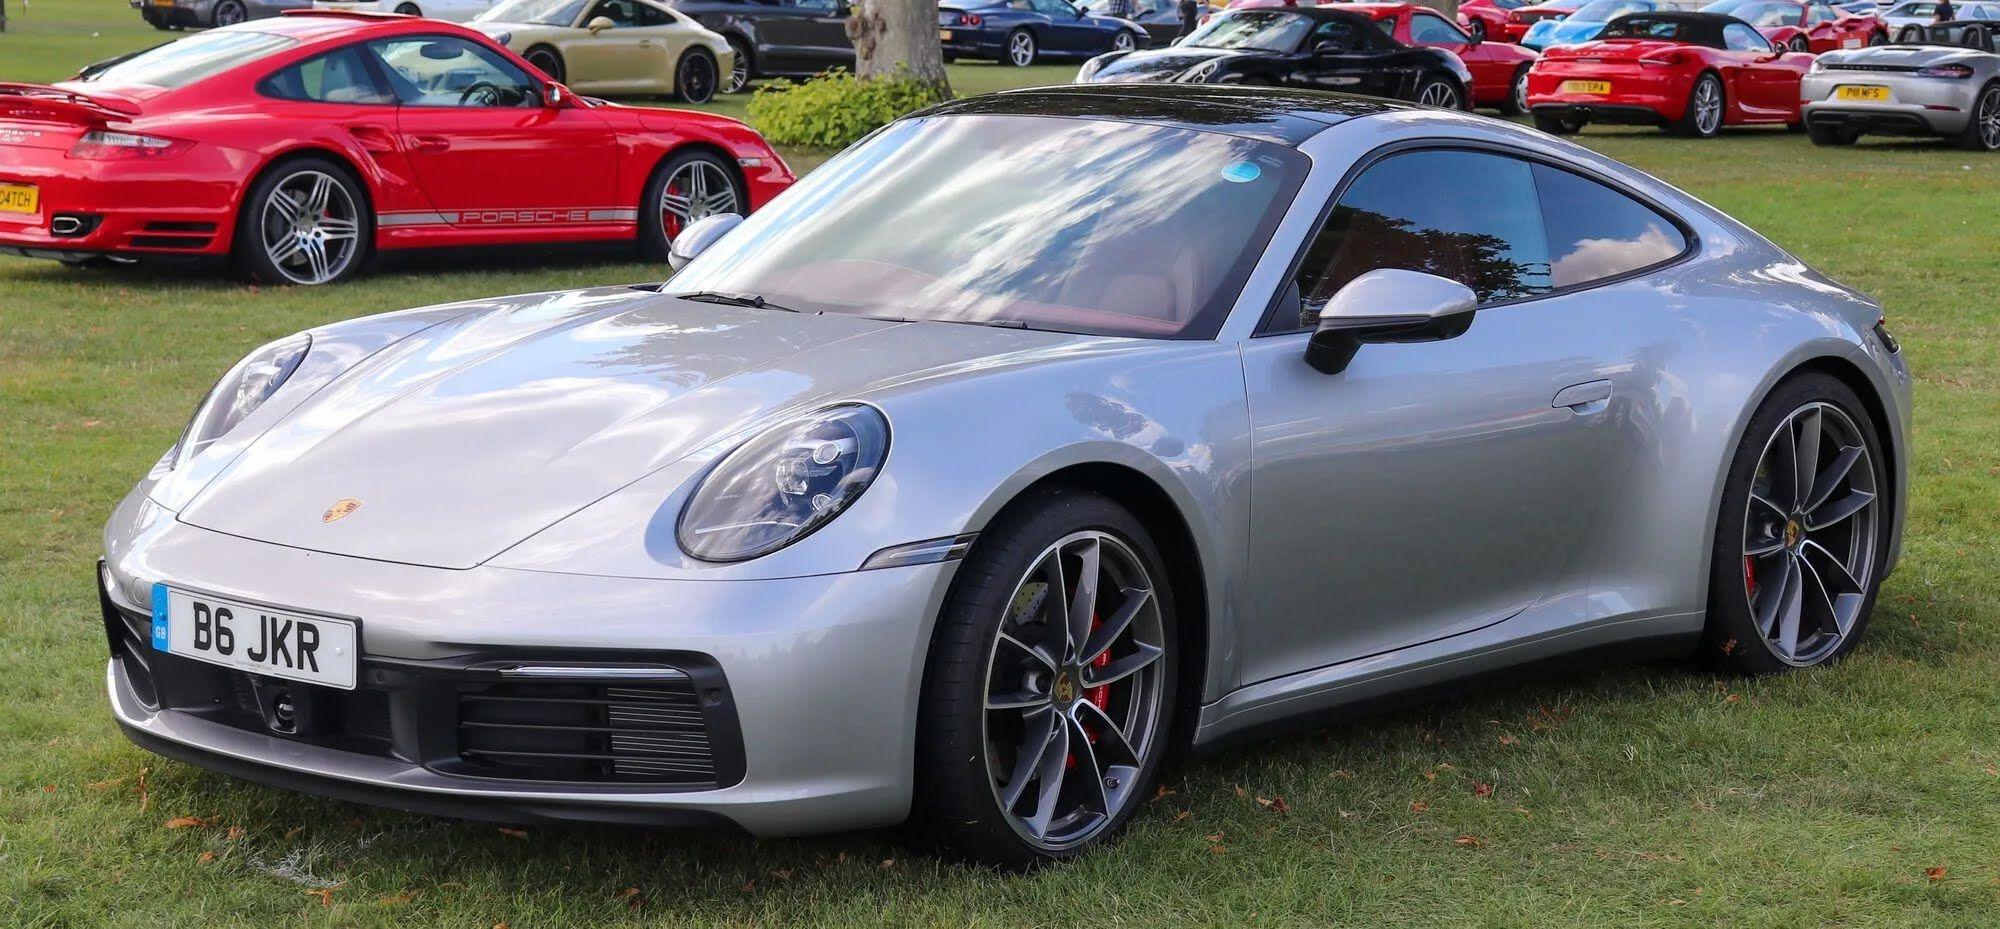 Porsche 911 впервые вышел в 1963 году